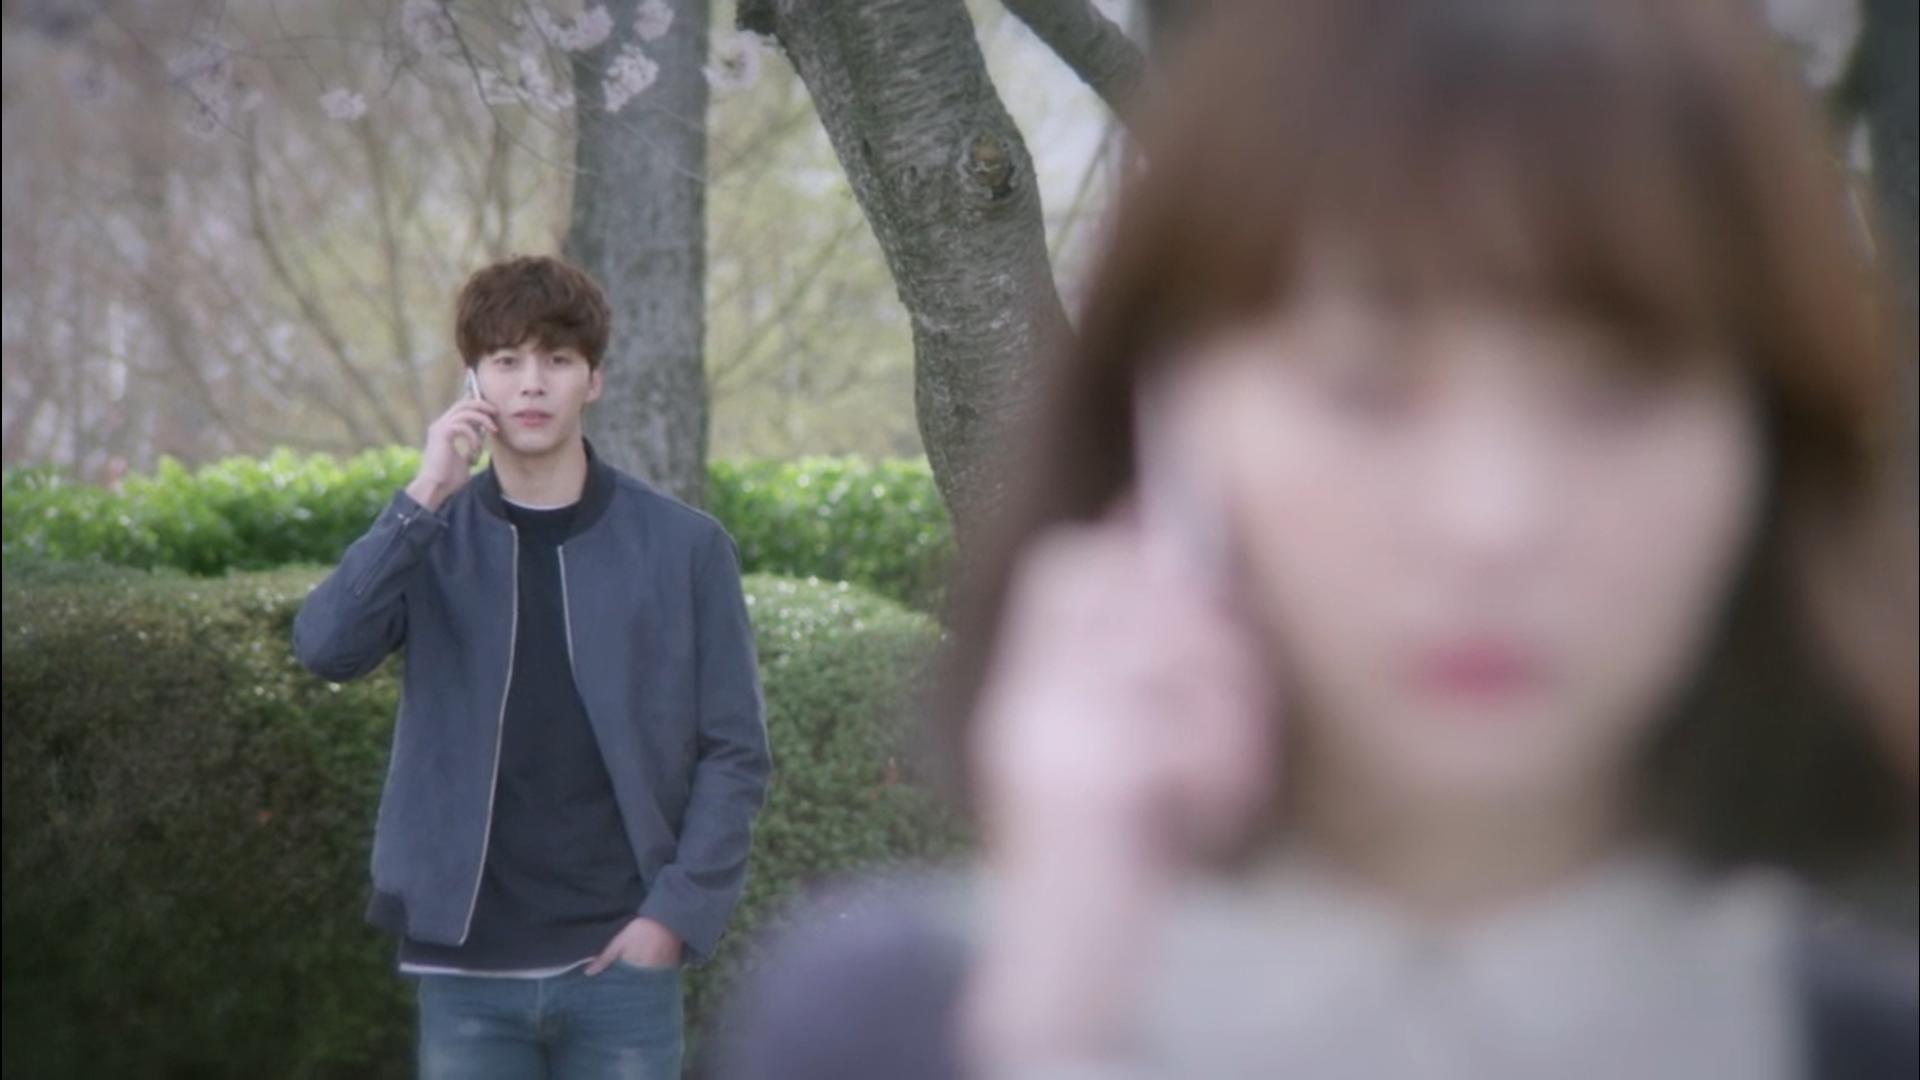 Wednesday 3:30 PM Yoon Jae-won talking to Seon Eun-woo on the phone